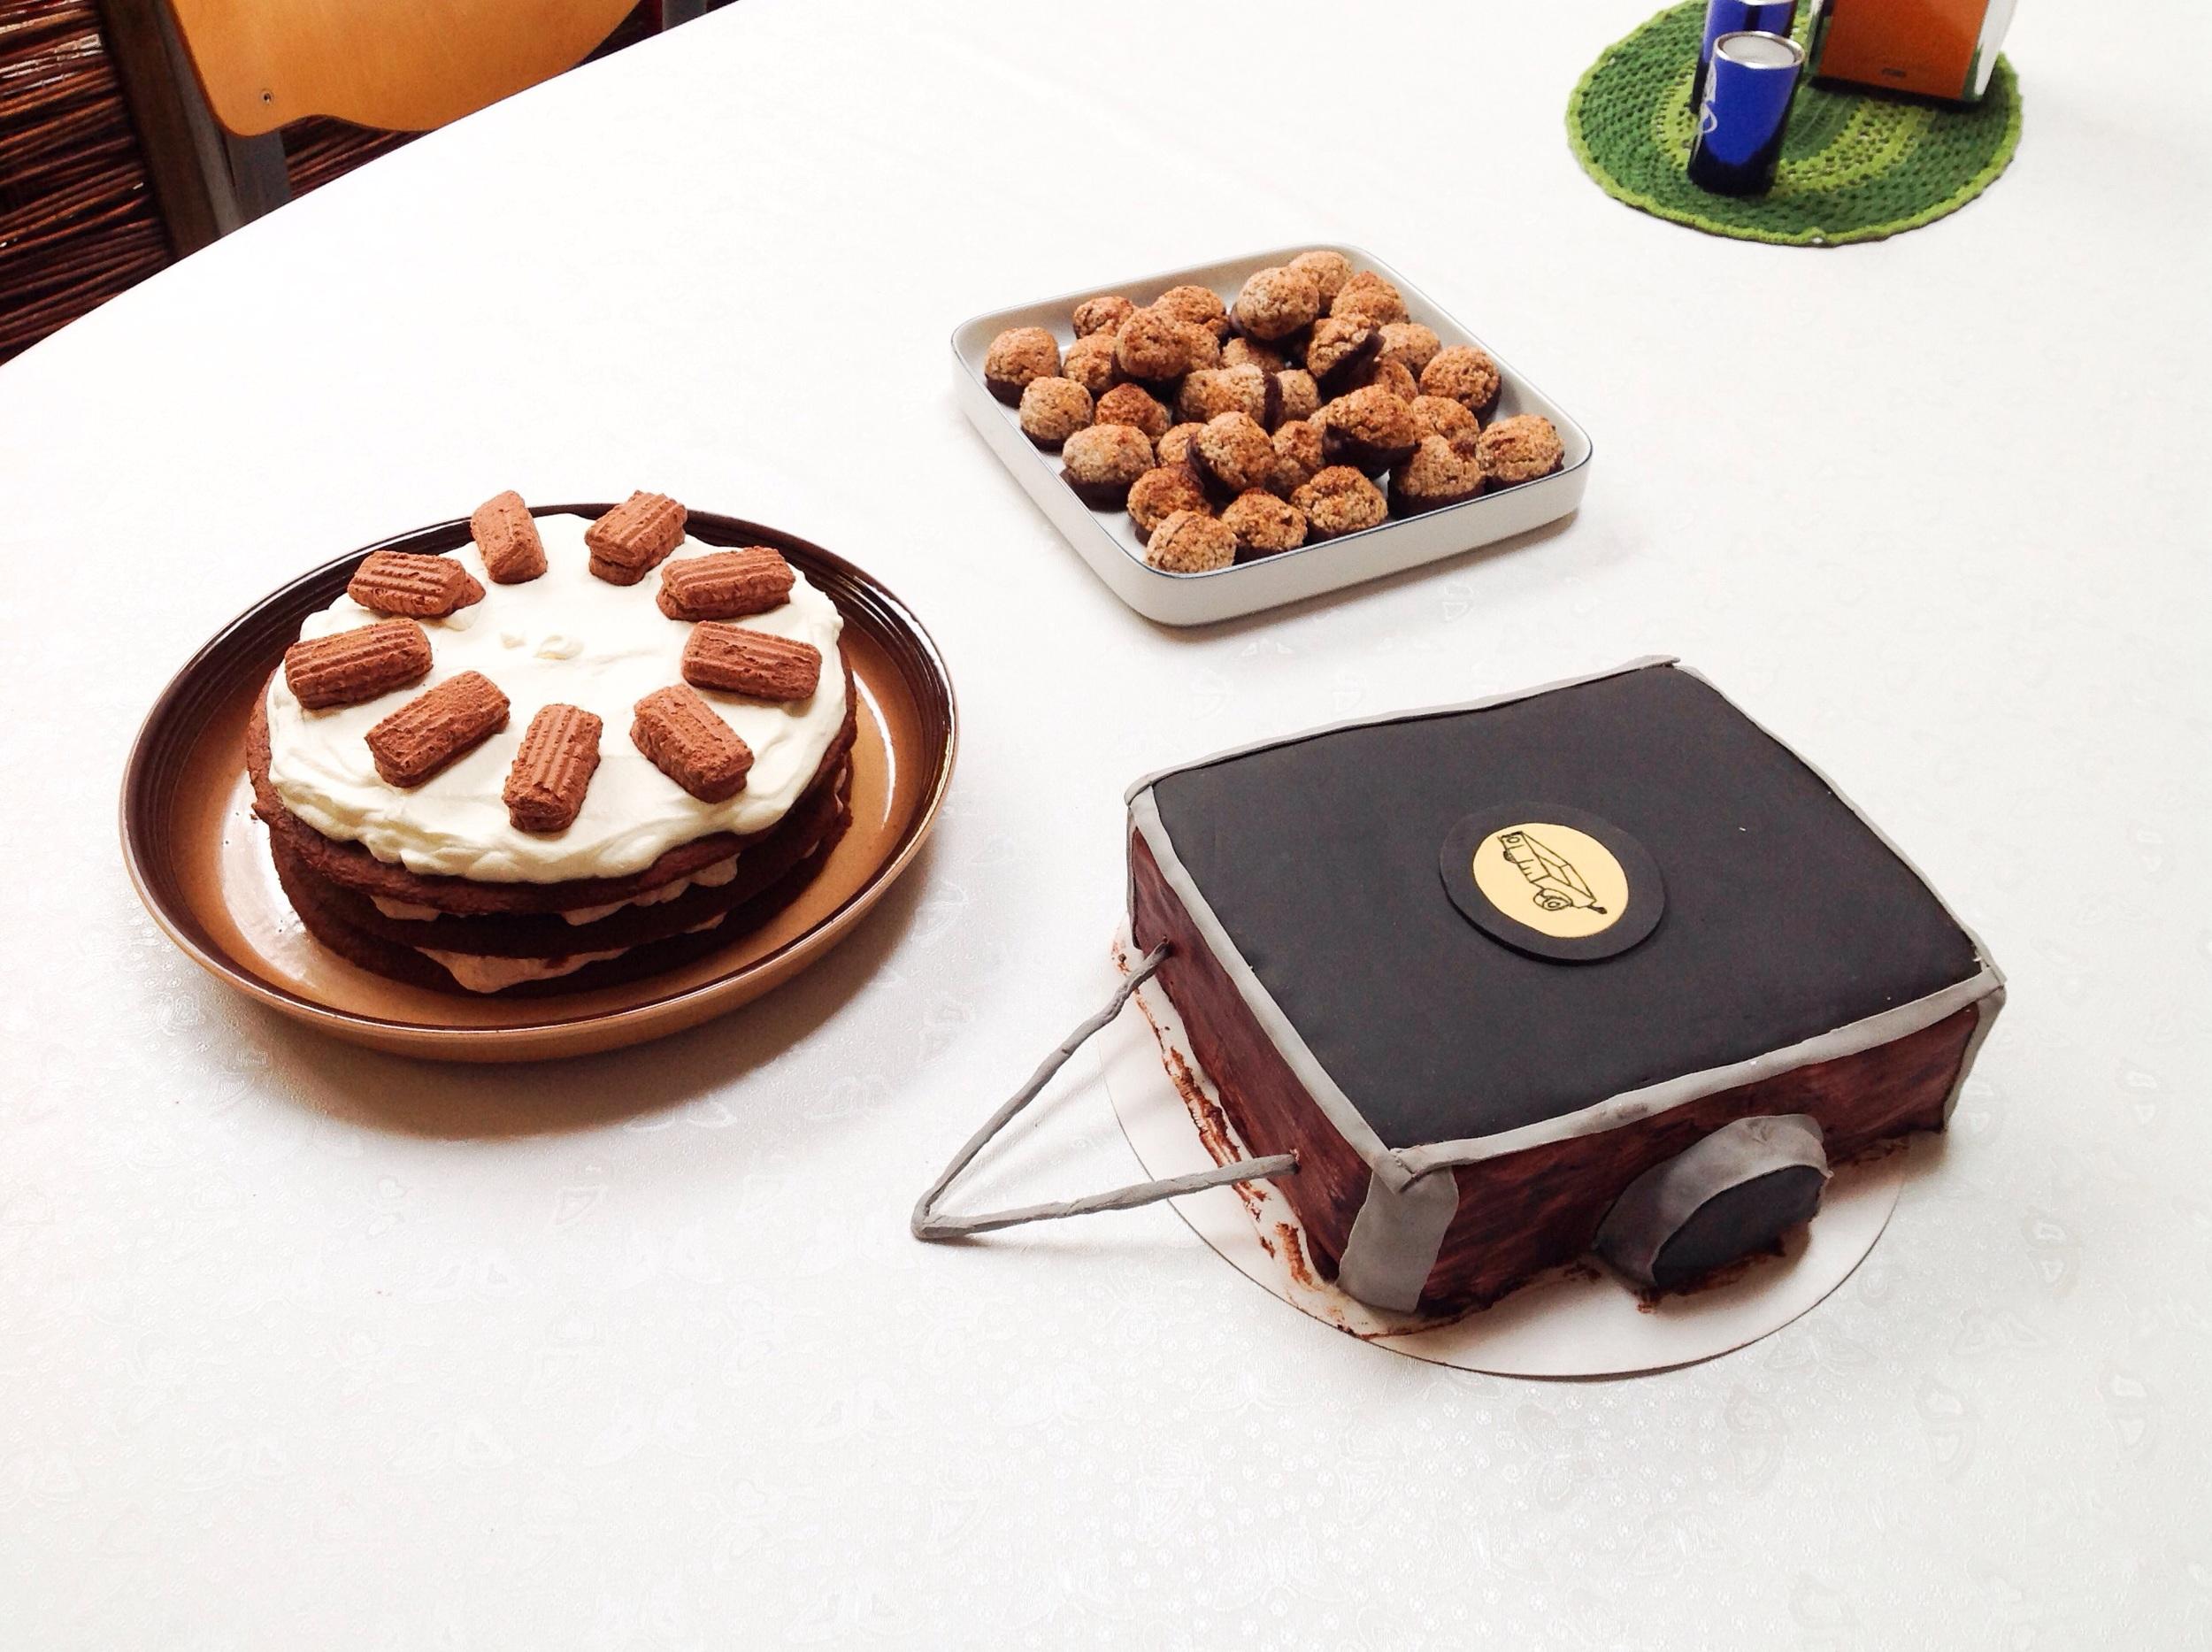 Klubbens første trailer-kage, samt andre dejlige kager.